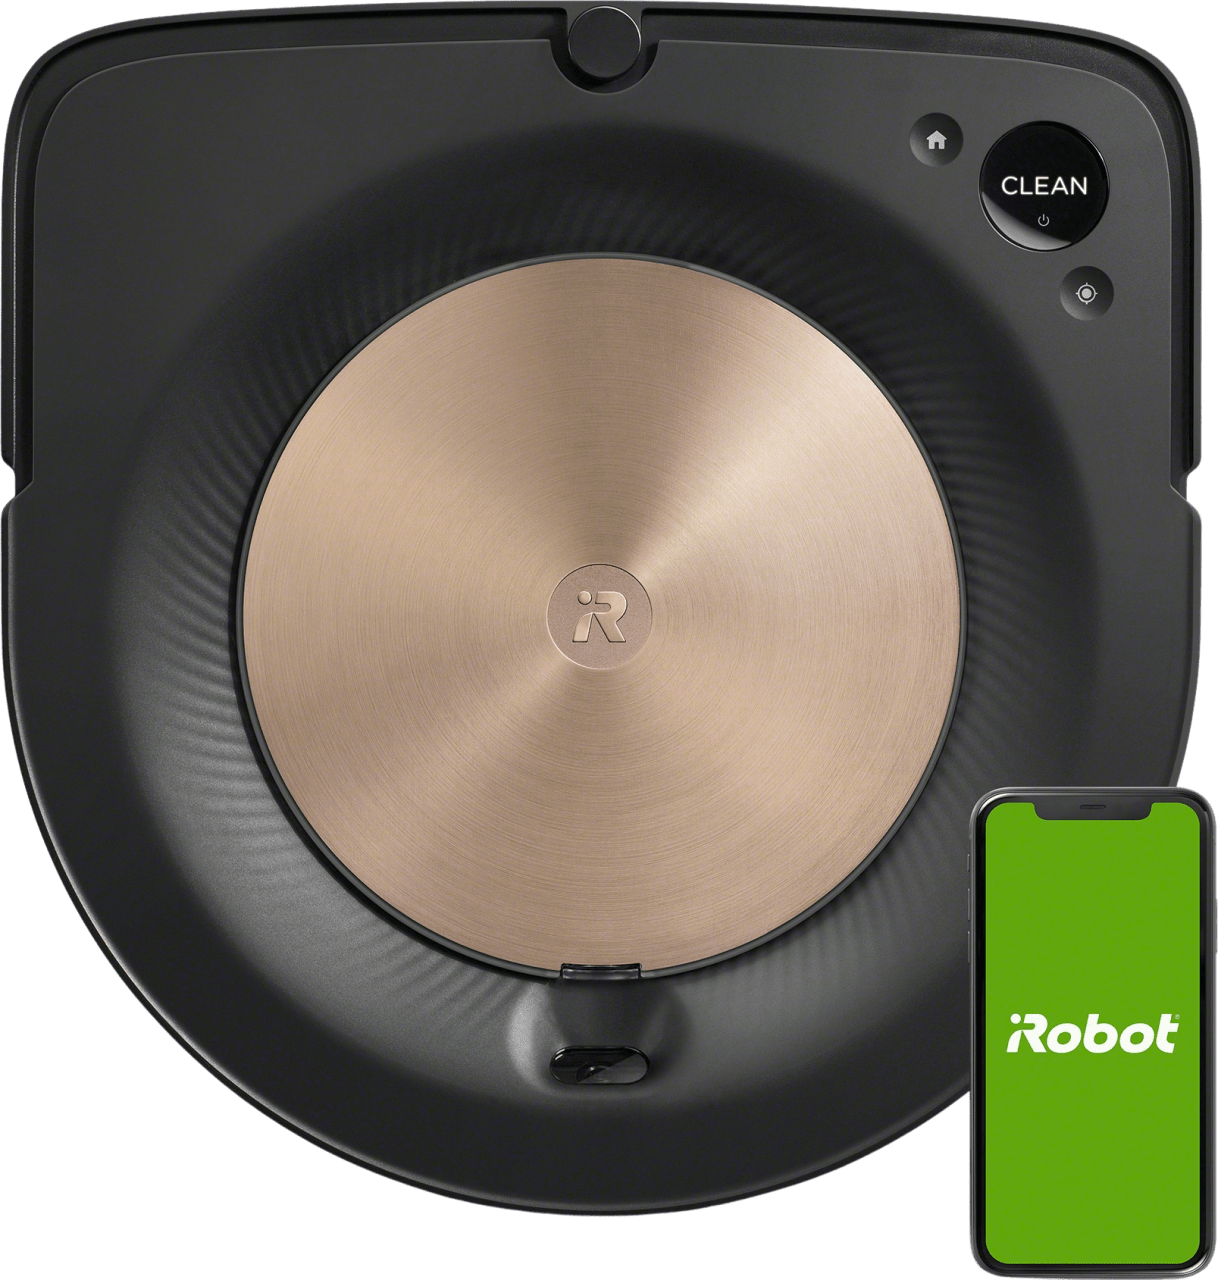 Schwarz iRobot Roomba s9 Saugroboter.1